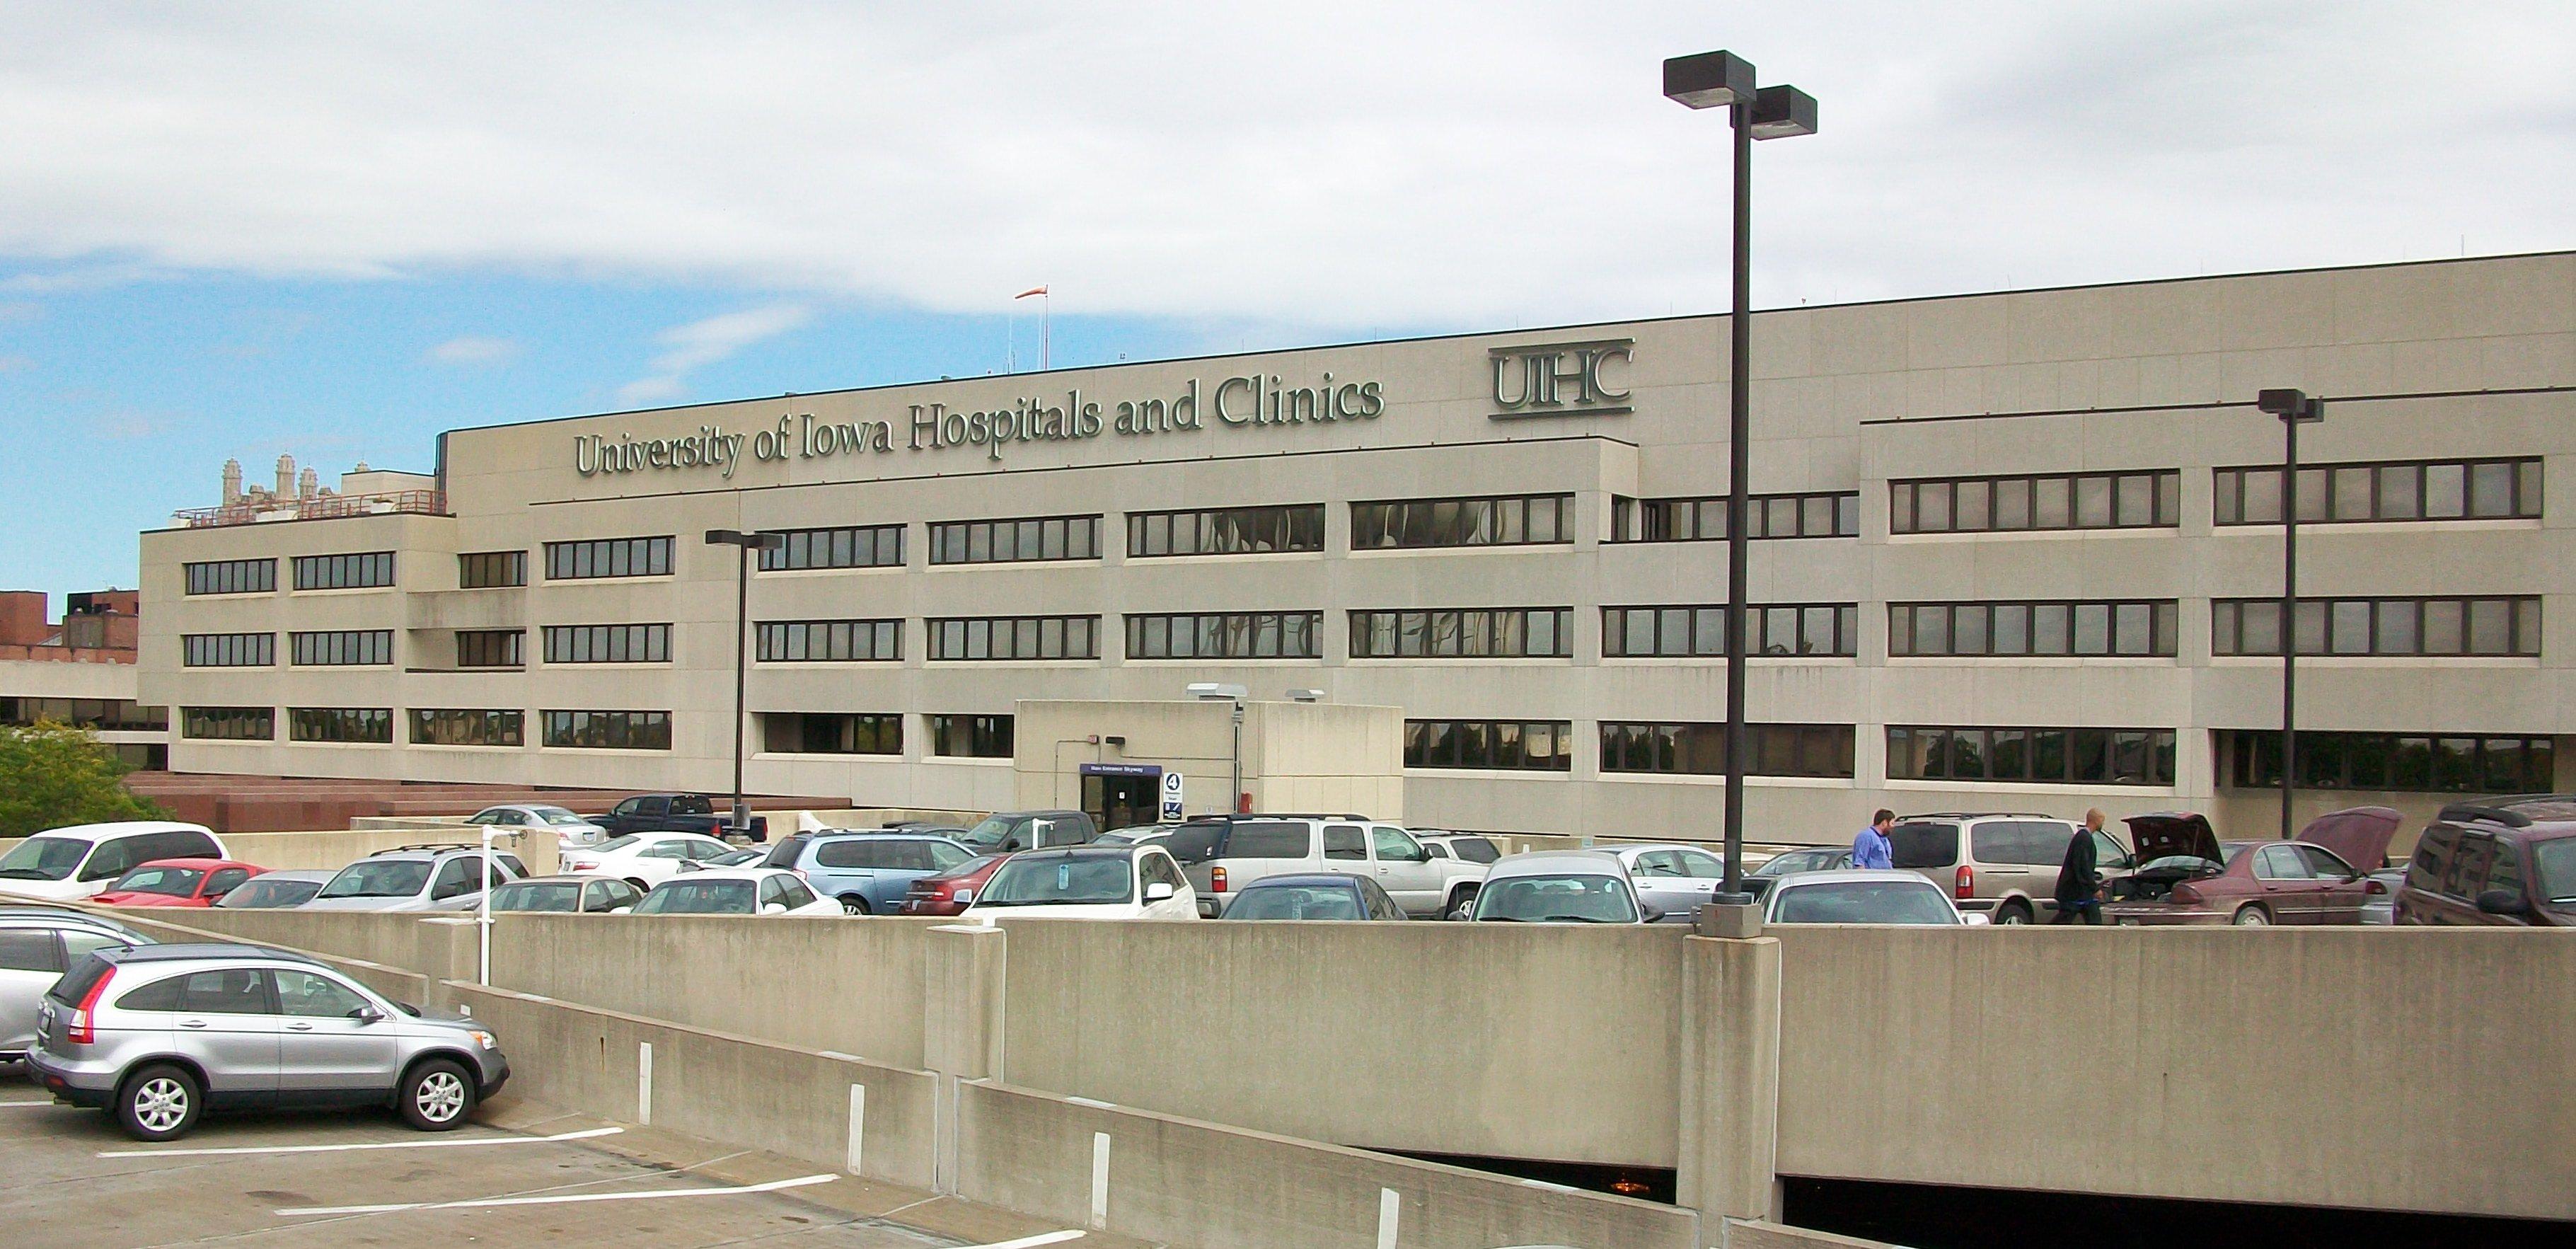 Penn Hospital Emergency Room Phone Number